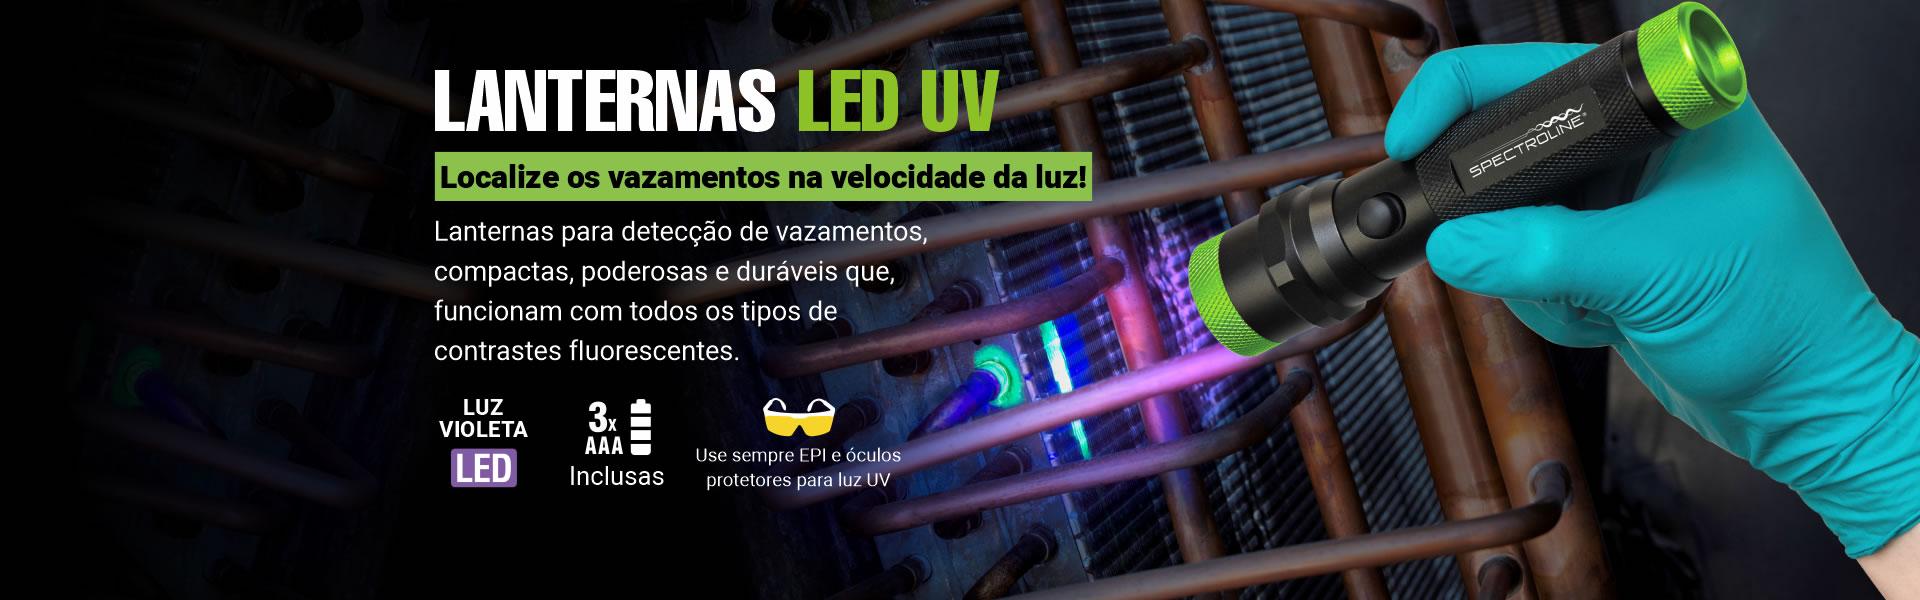 Lanternas UV